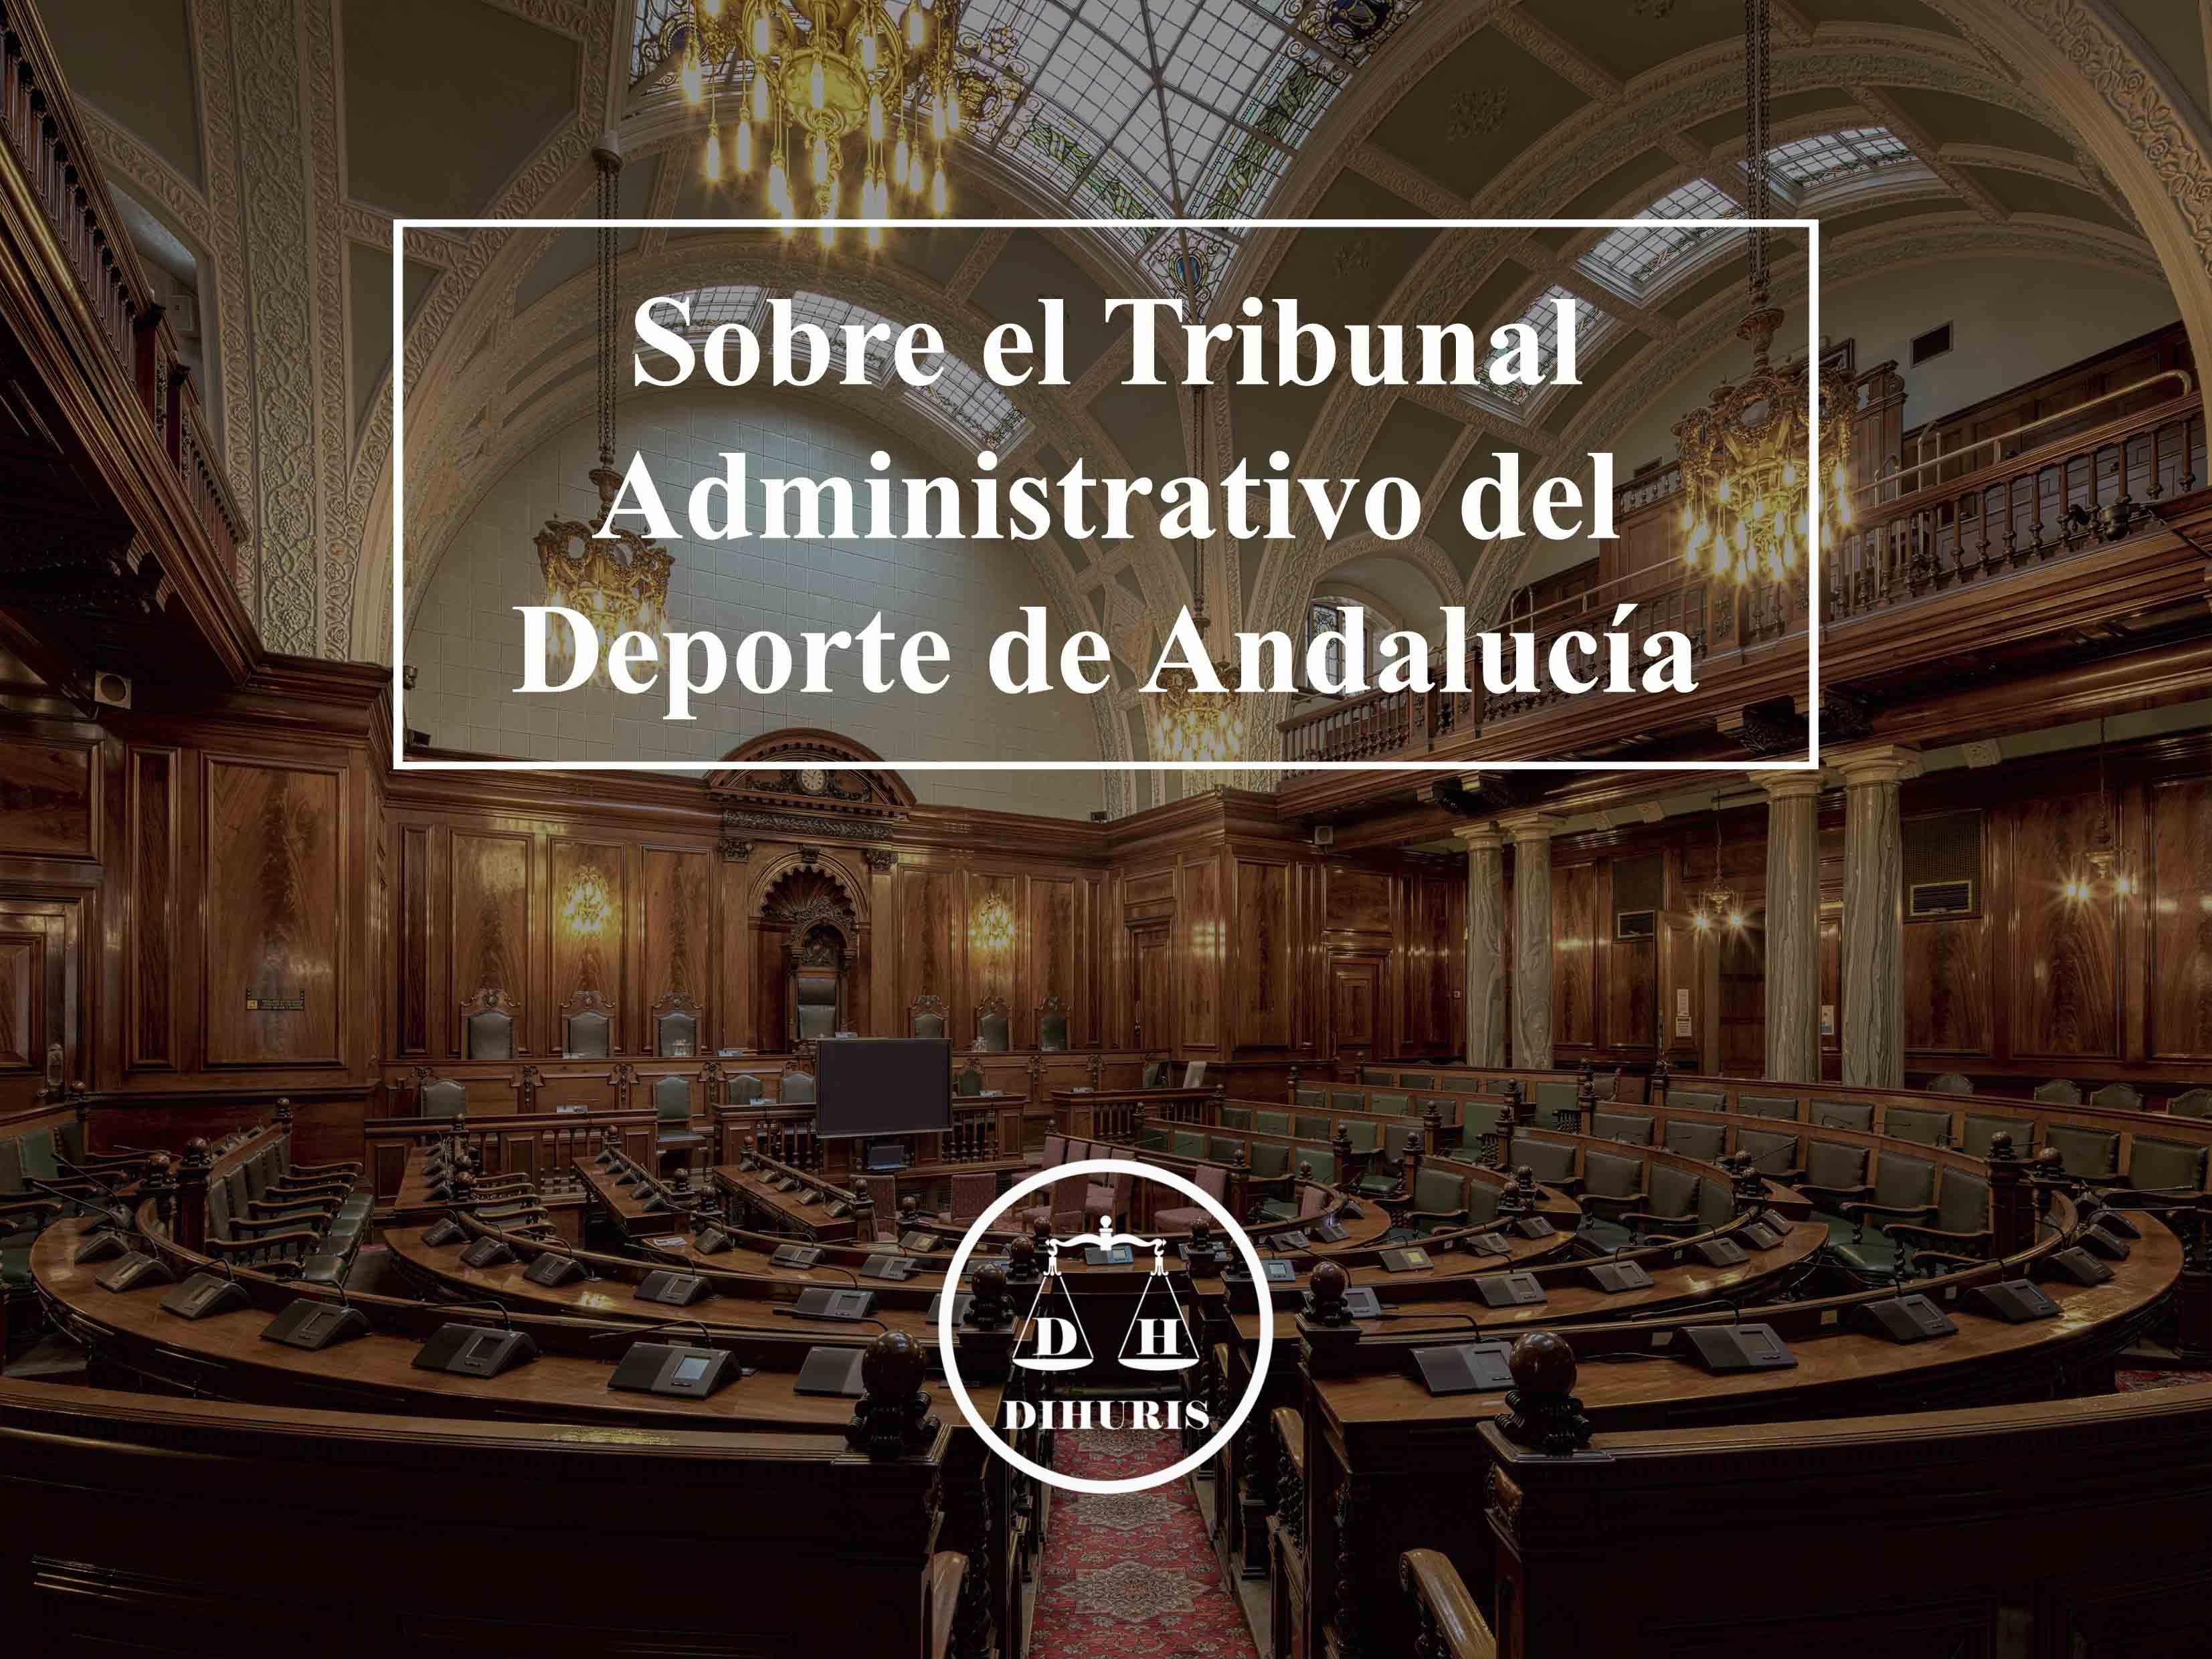 Sobre el Tribunal Administrativo del Deporte de Andalucía | DIHURIS